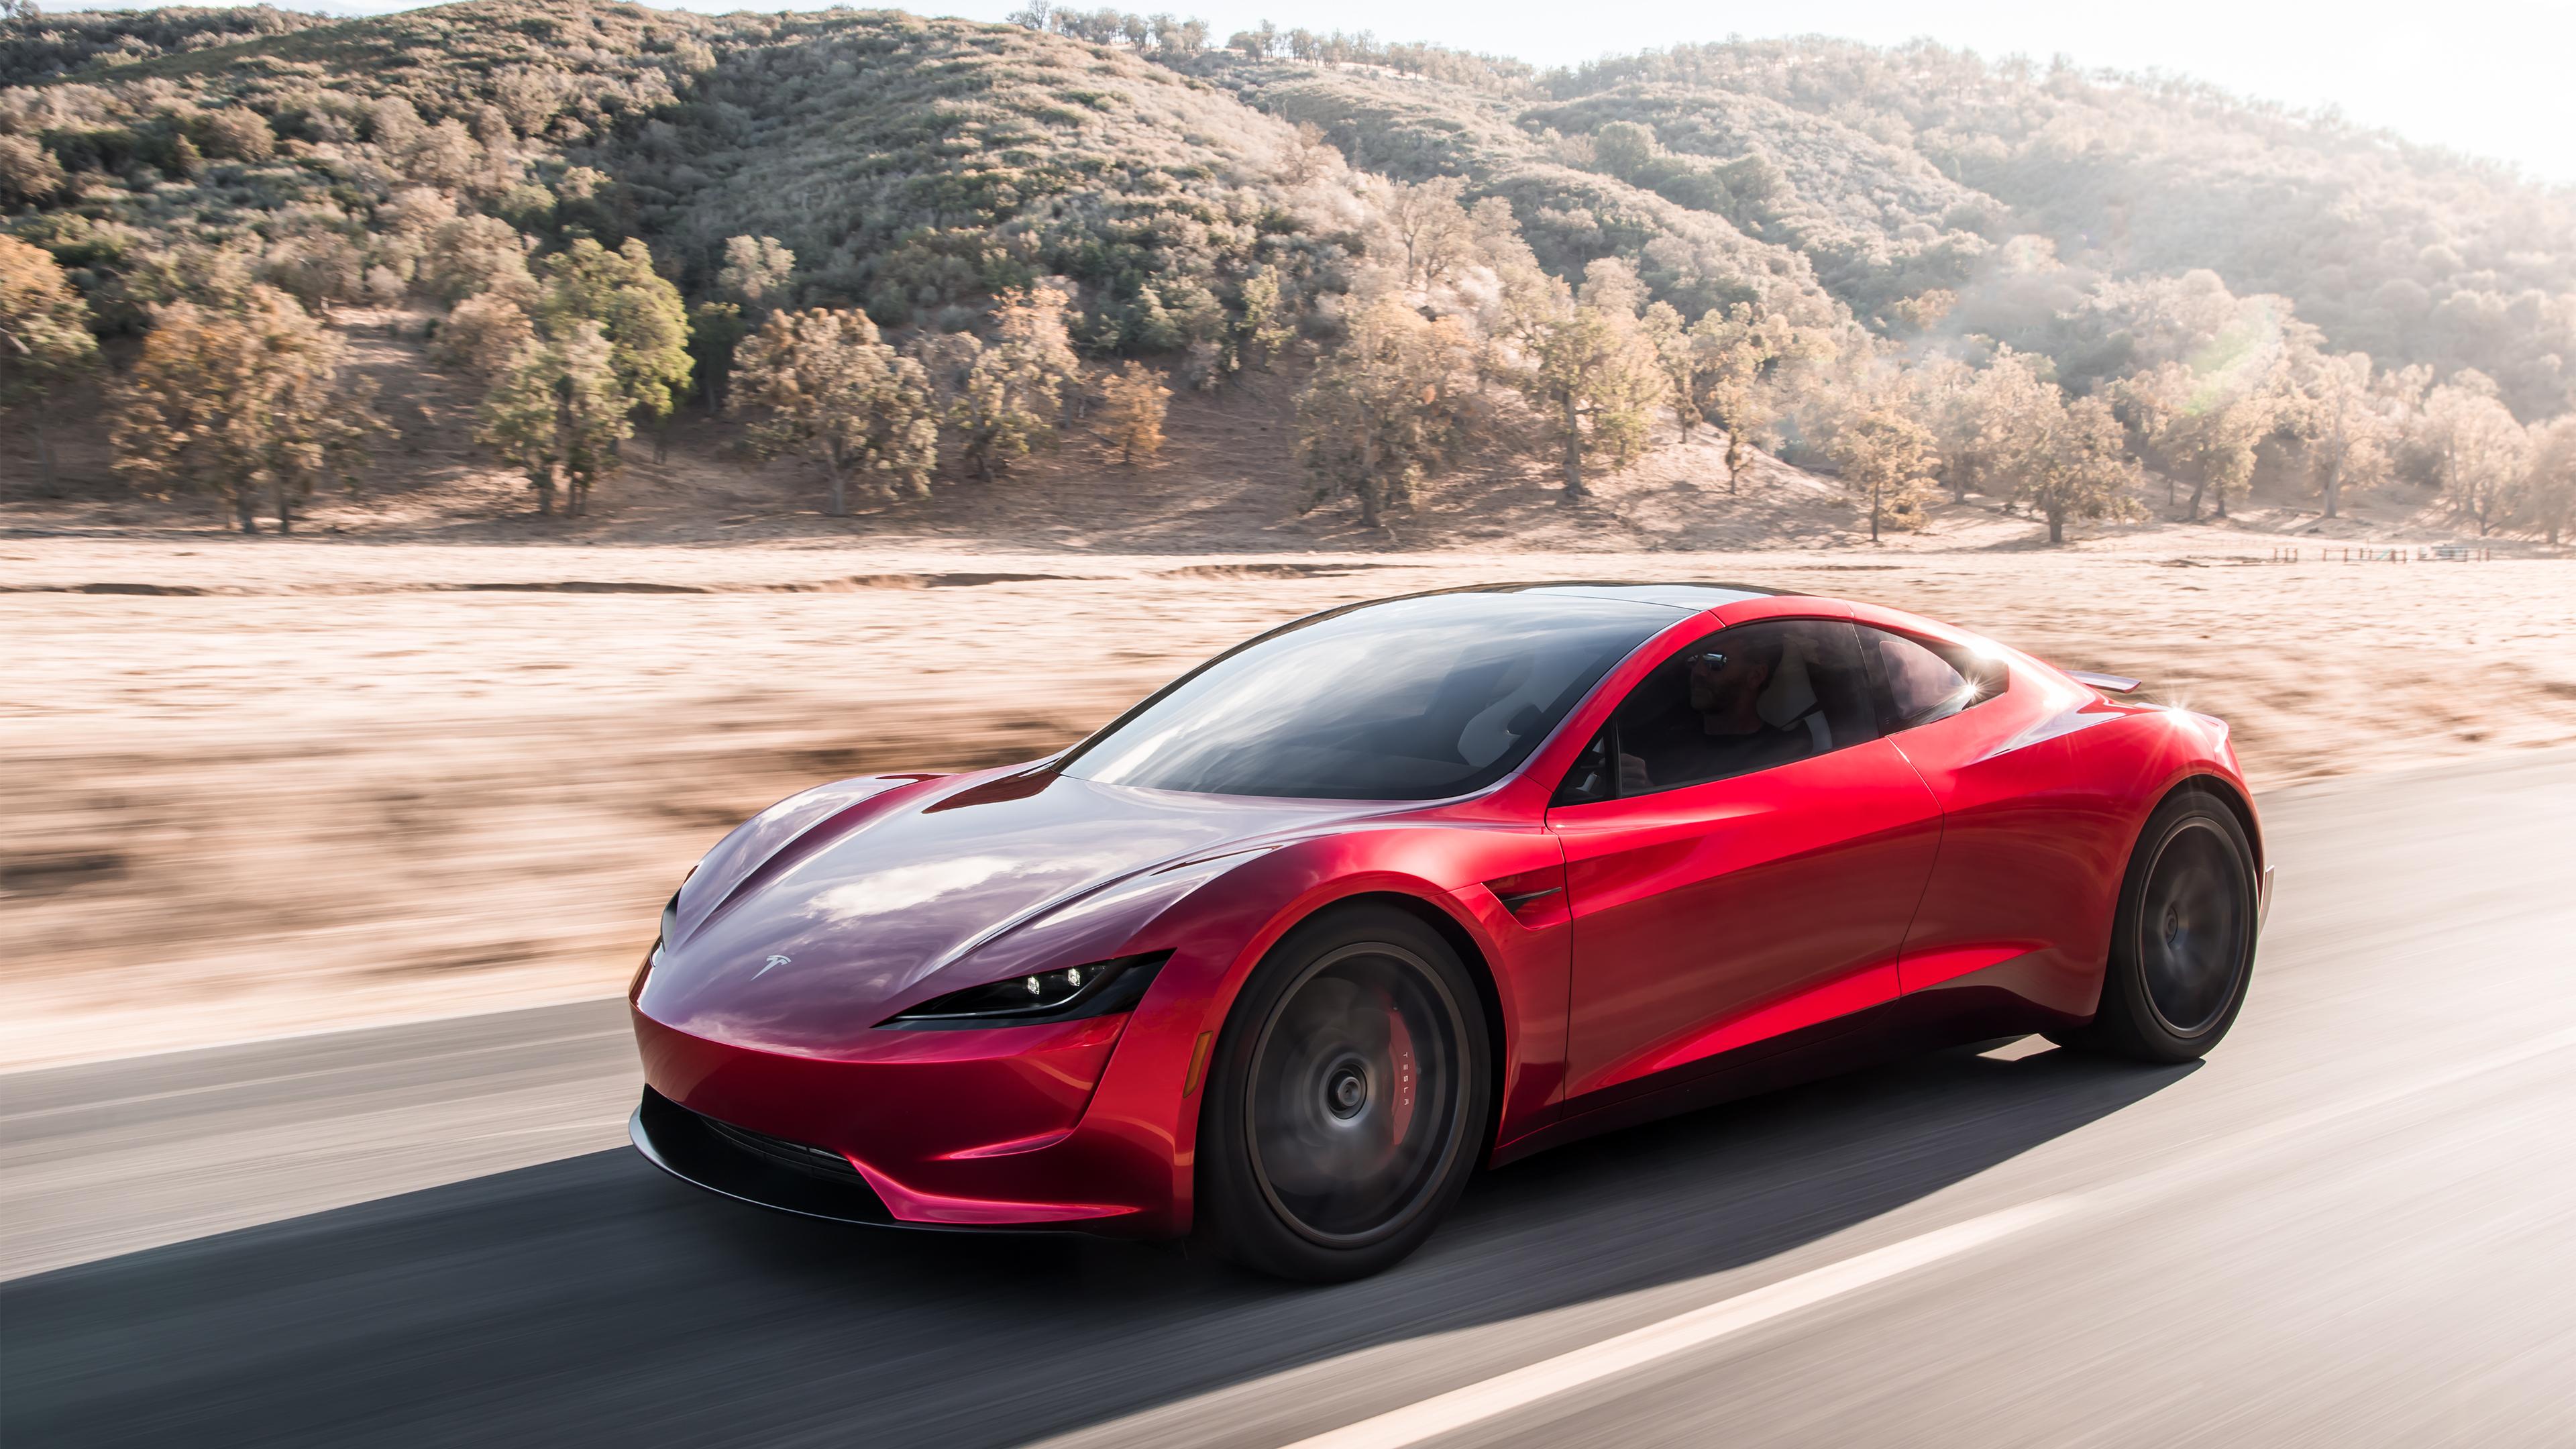 General 3840x2160 car Tesla Motors Tesla Roadster supercars sports car electric car road photography trees Tesla